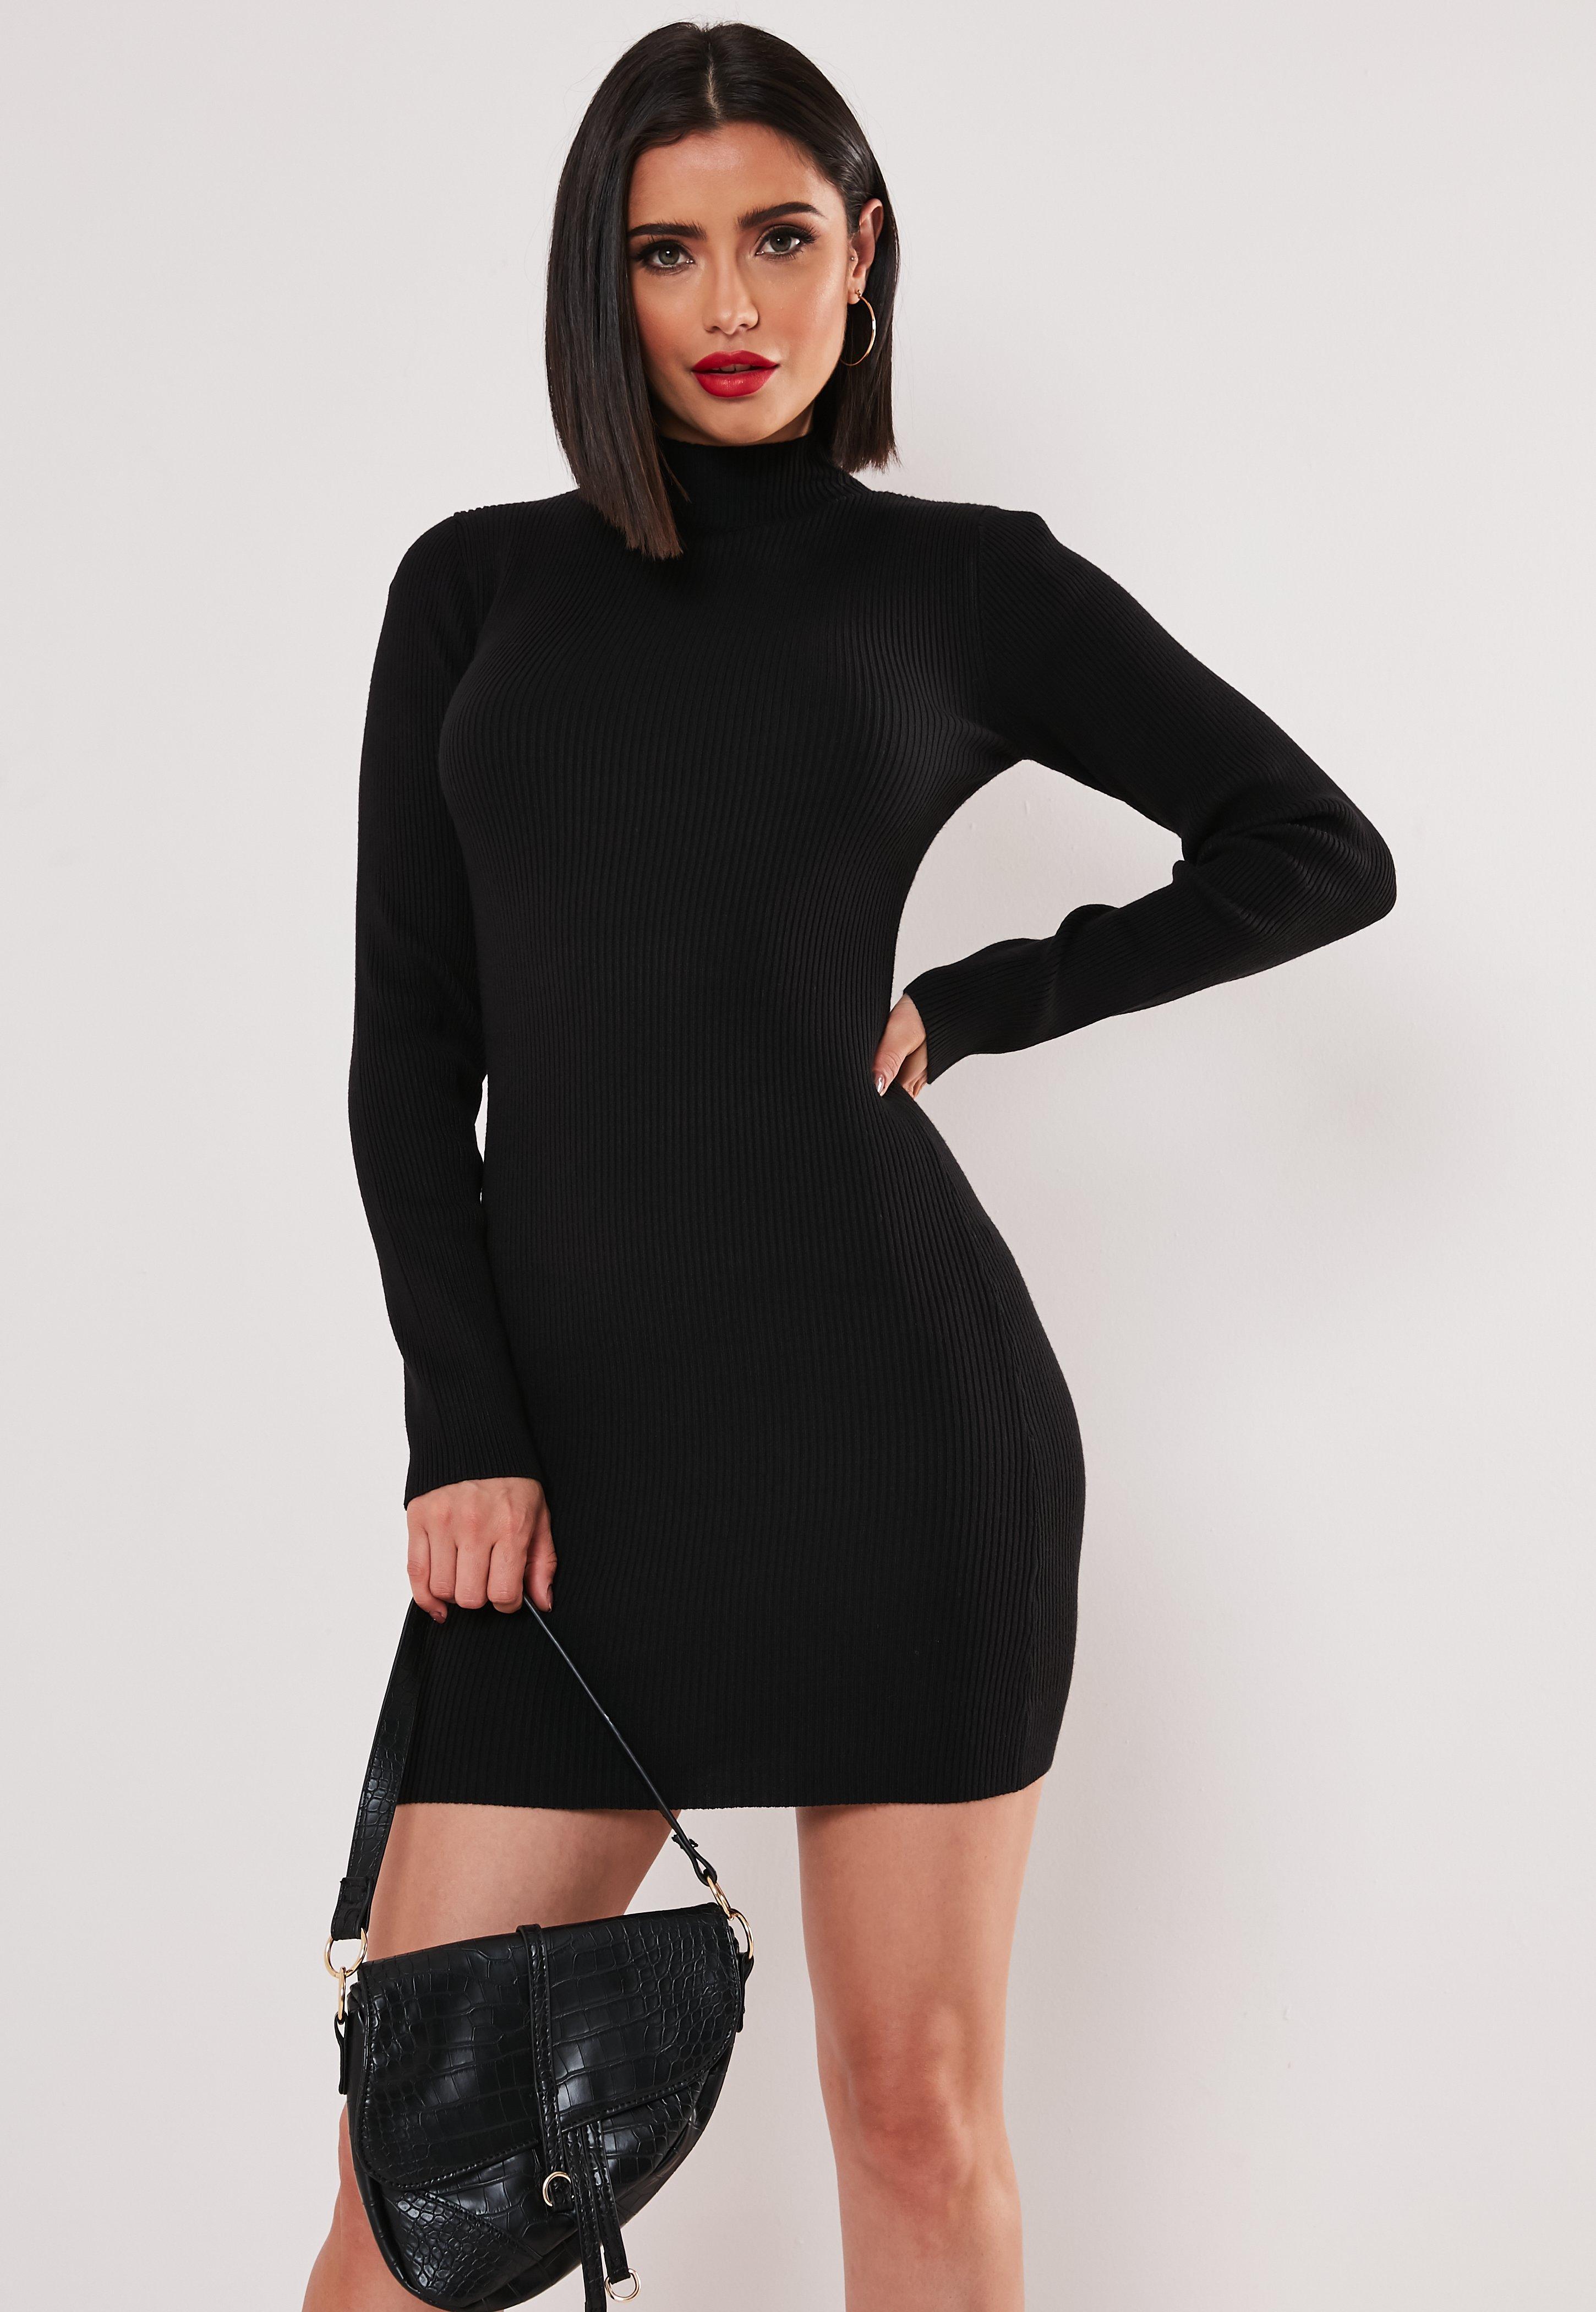 Missguided Basic High Neck Long Sleeve Jumper Dress Cheap Latest Collections Yz1jk